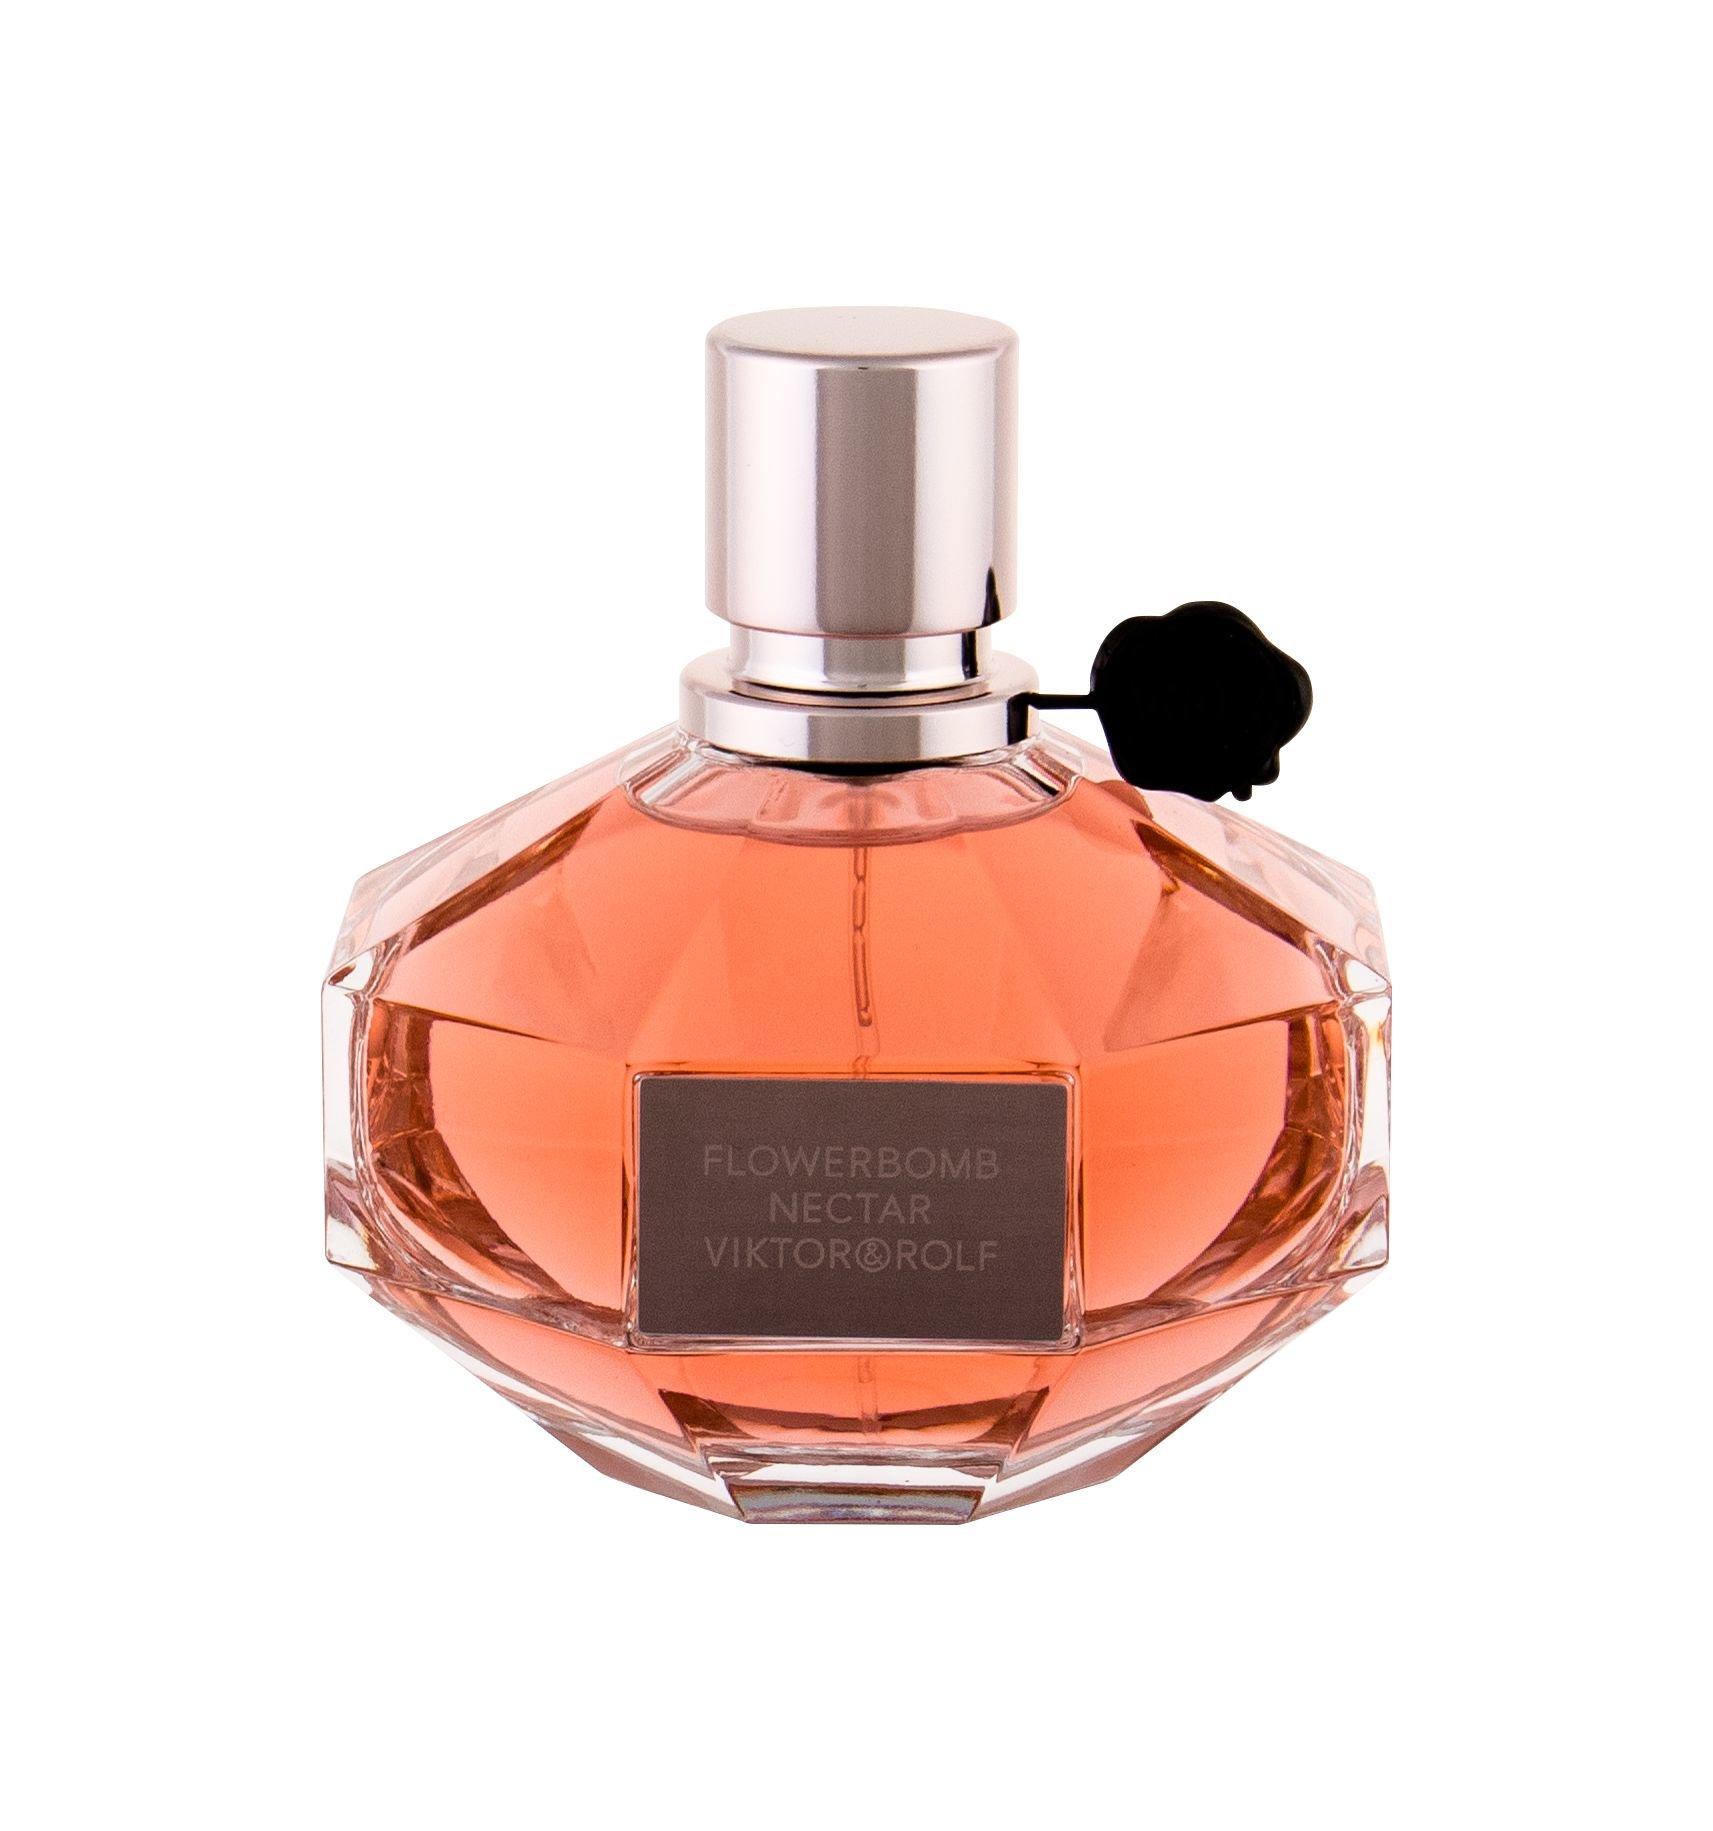 Viktor & Rolf Flowerbomb Eau de Parfum 90ml